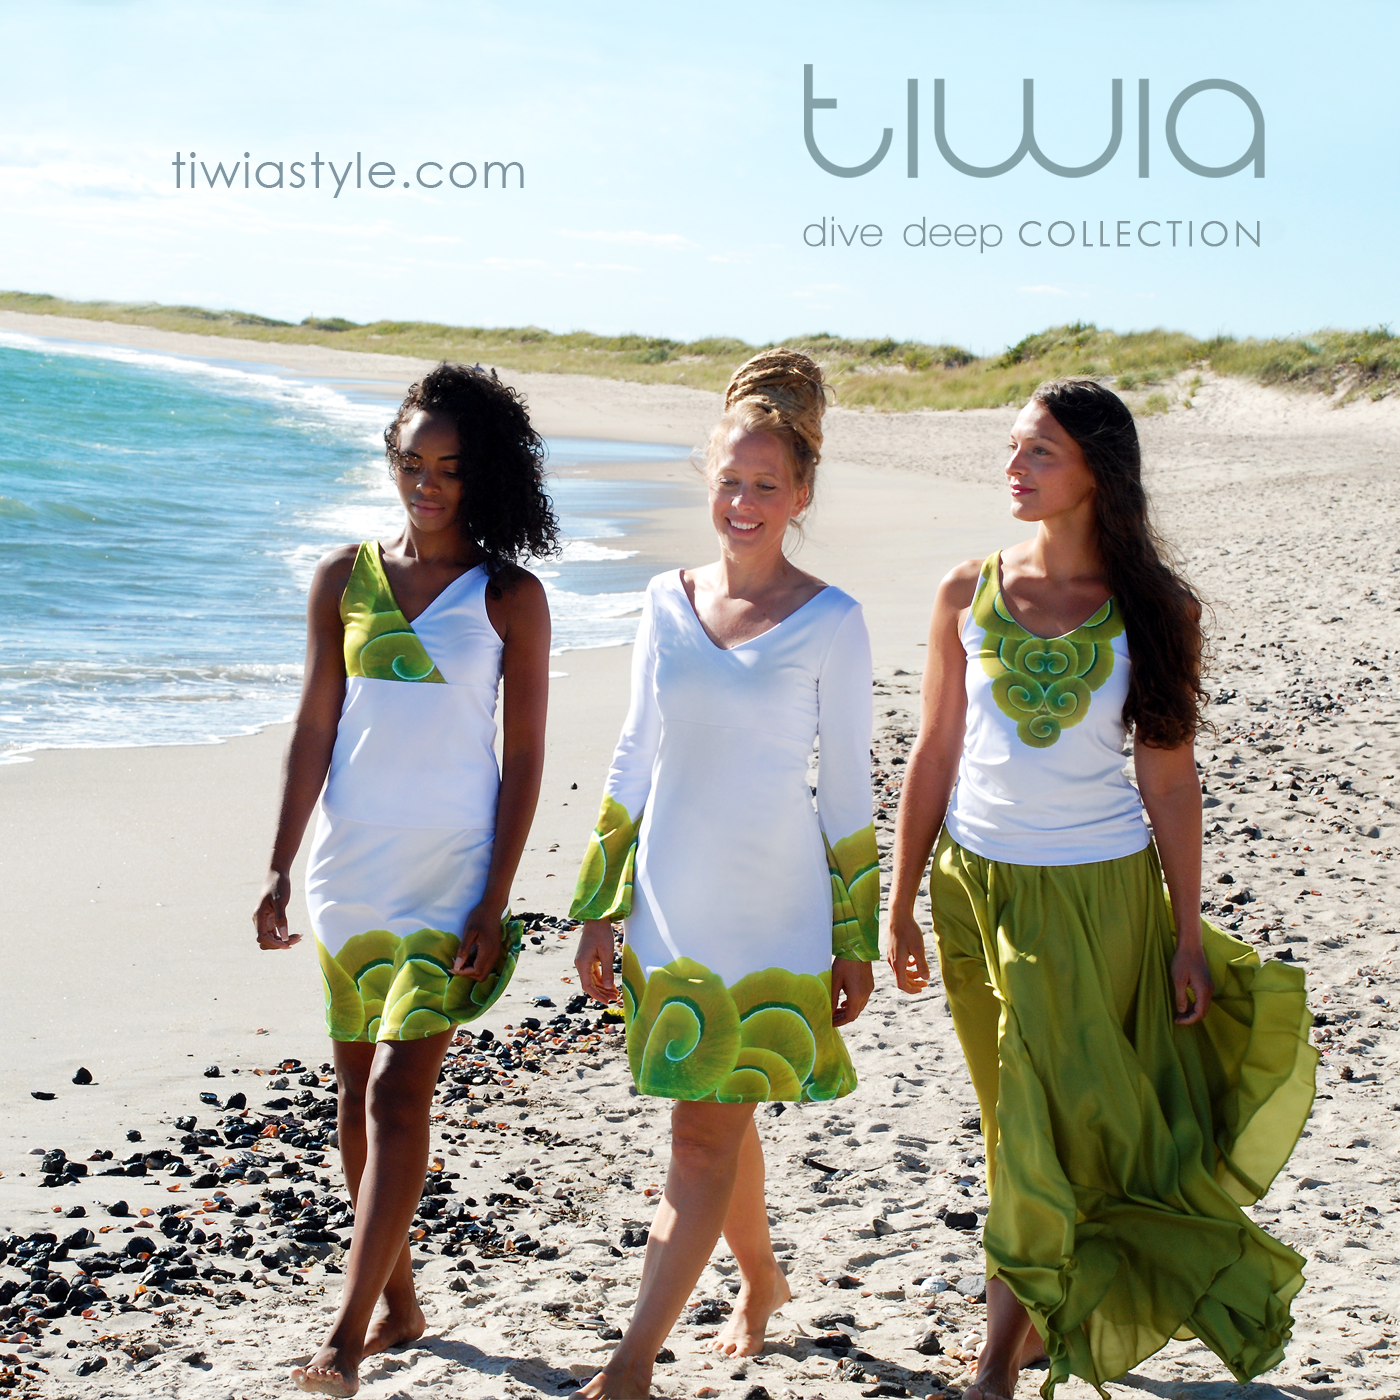 tiwia dive deep ad instagram three models spiral coral walking napatree.png